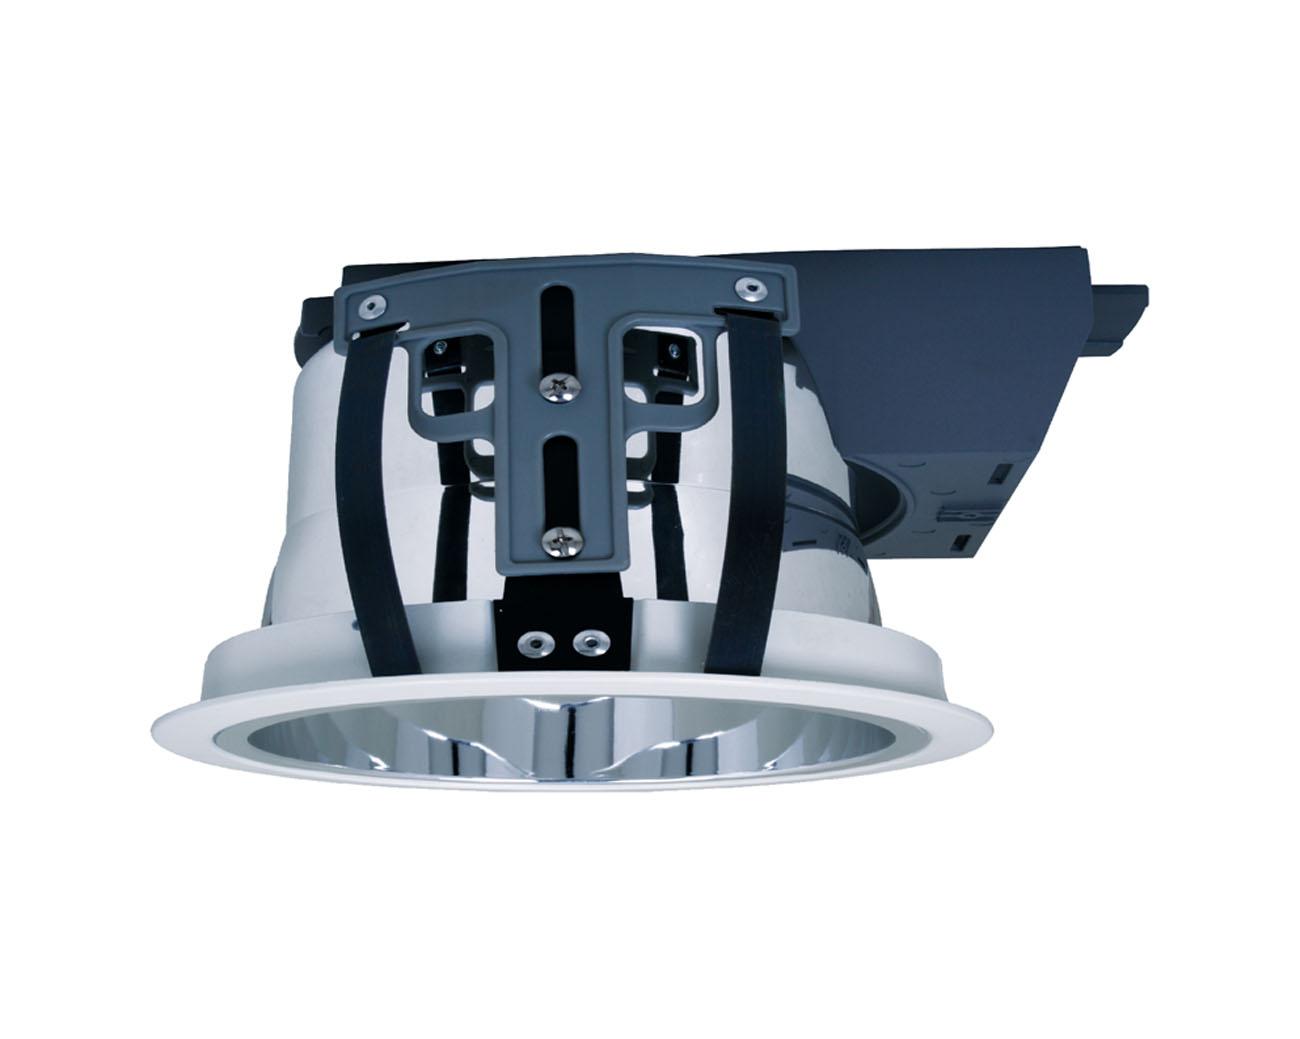 bpm lighting 8080 downlight round plc plt 2x32 42w 8080. Black Bedroom Furniture Sets. Home Design Ideas